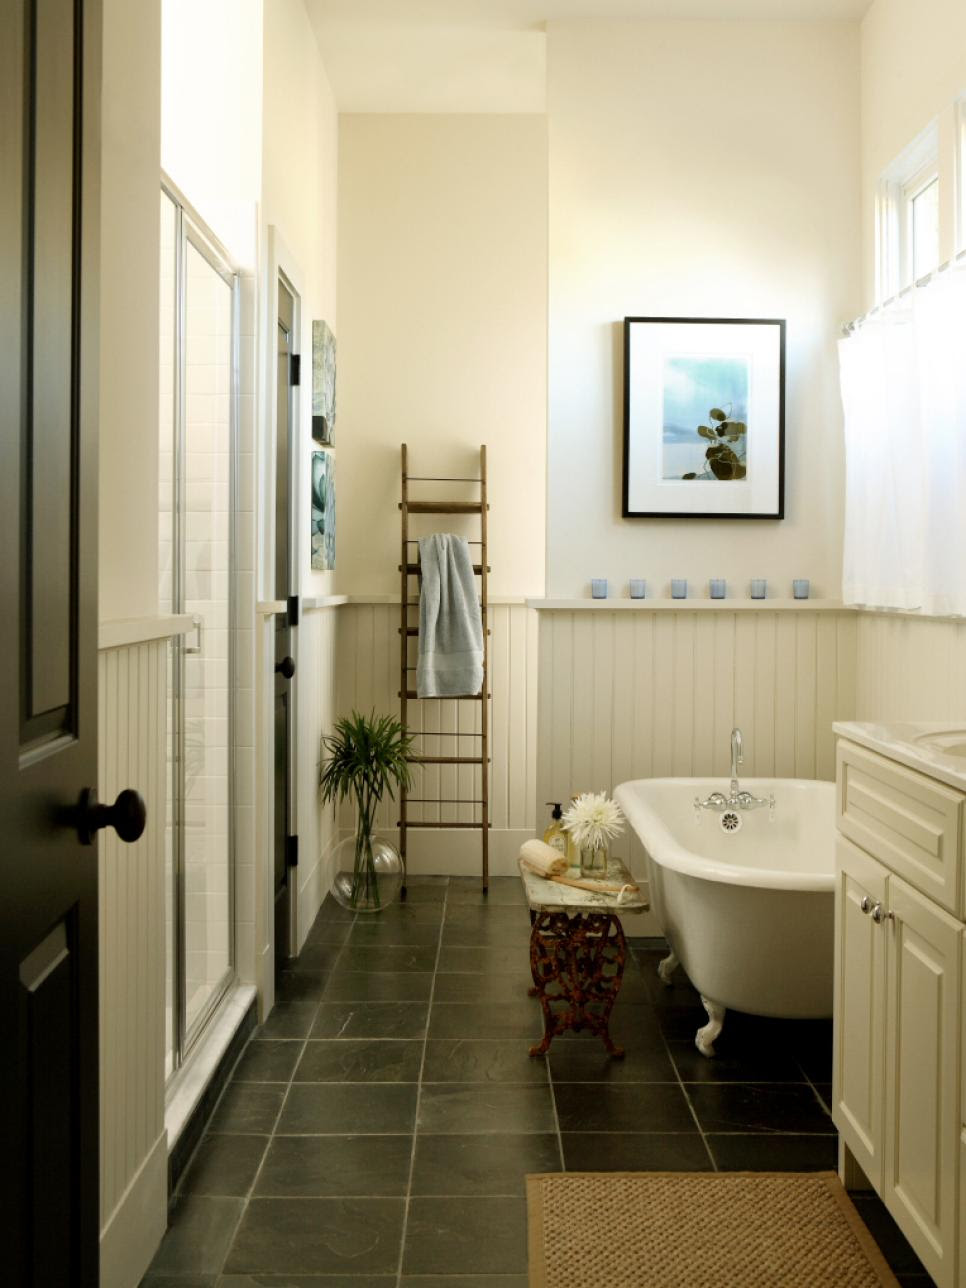 Bathroom Flooring Options | HGTV